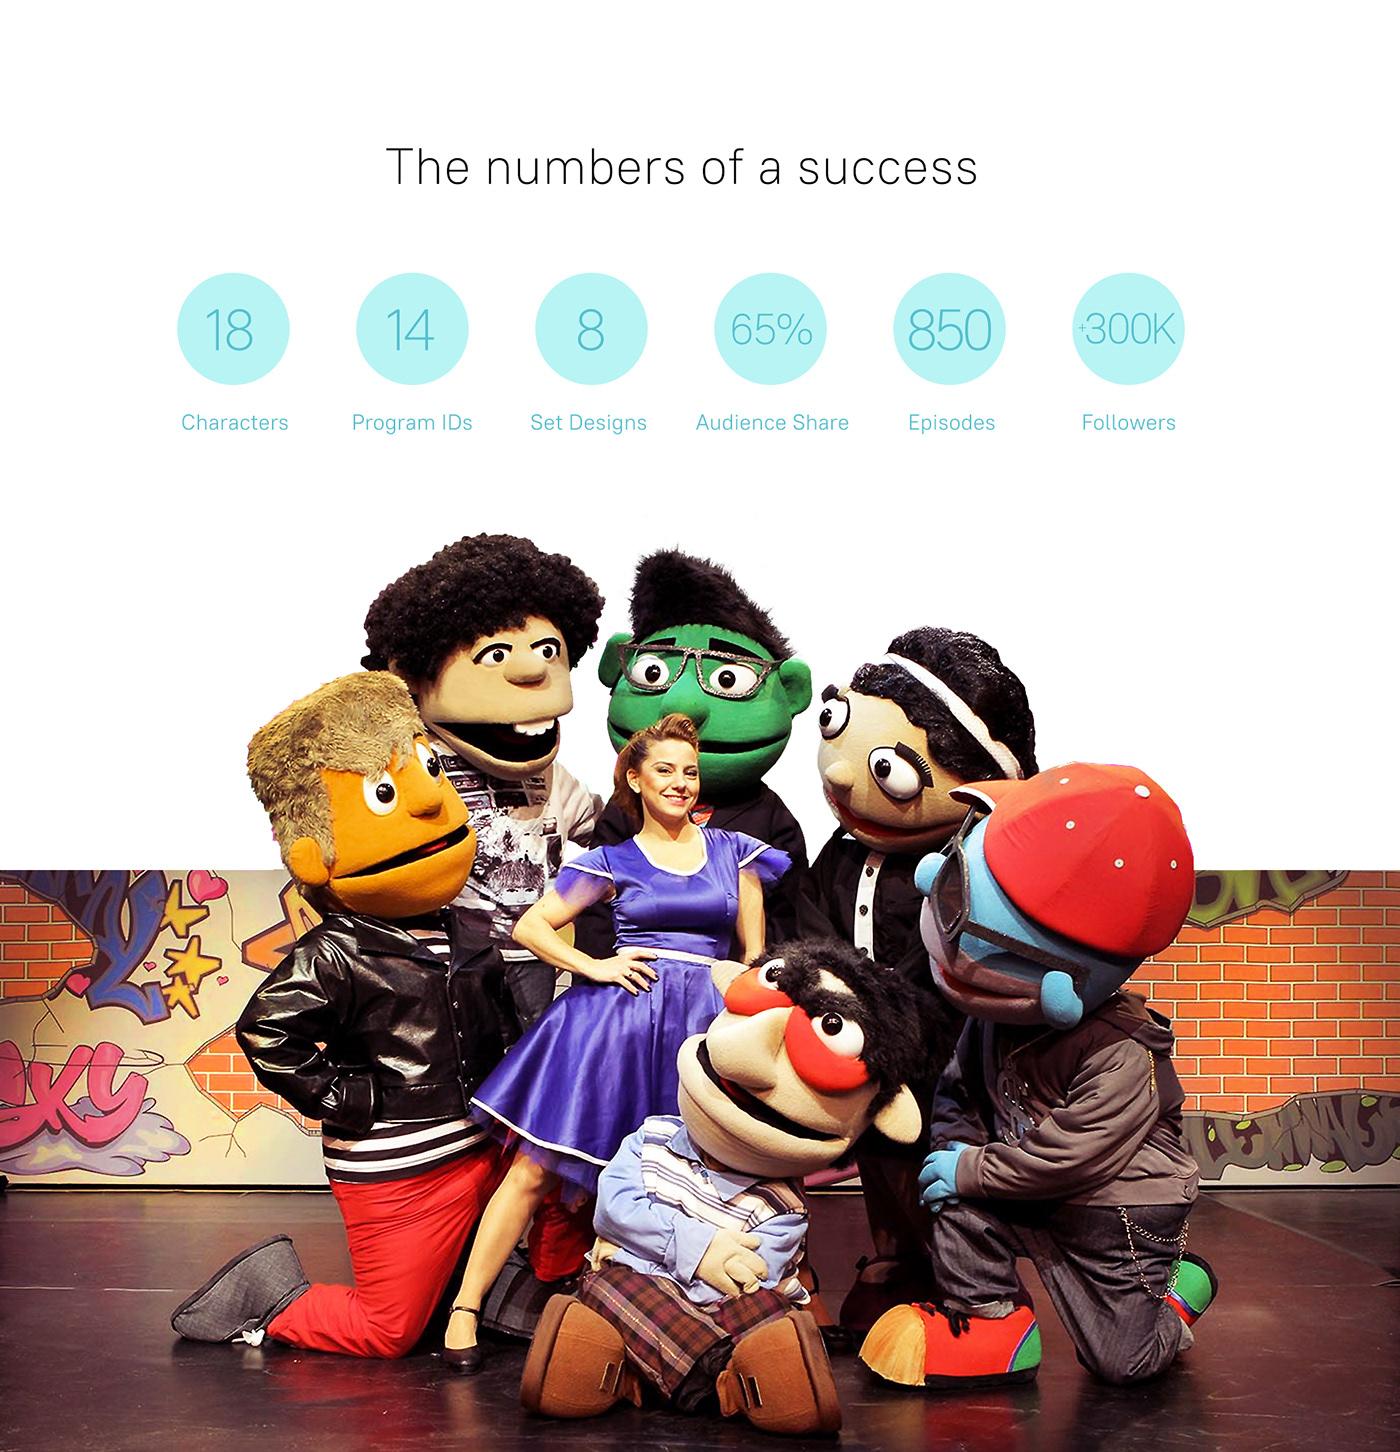 caricature   Case Study Character design  graphic design  ID puppets tv TV content design